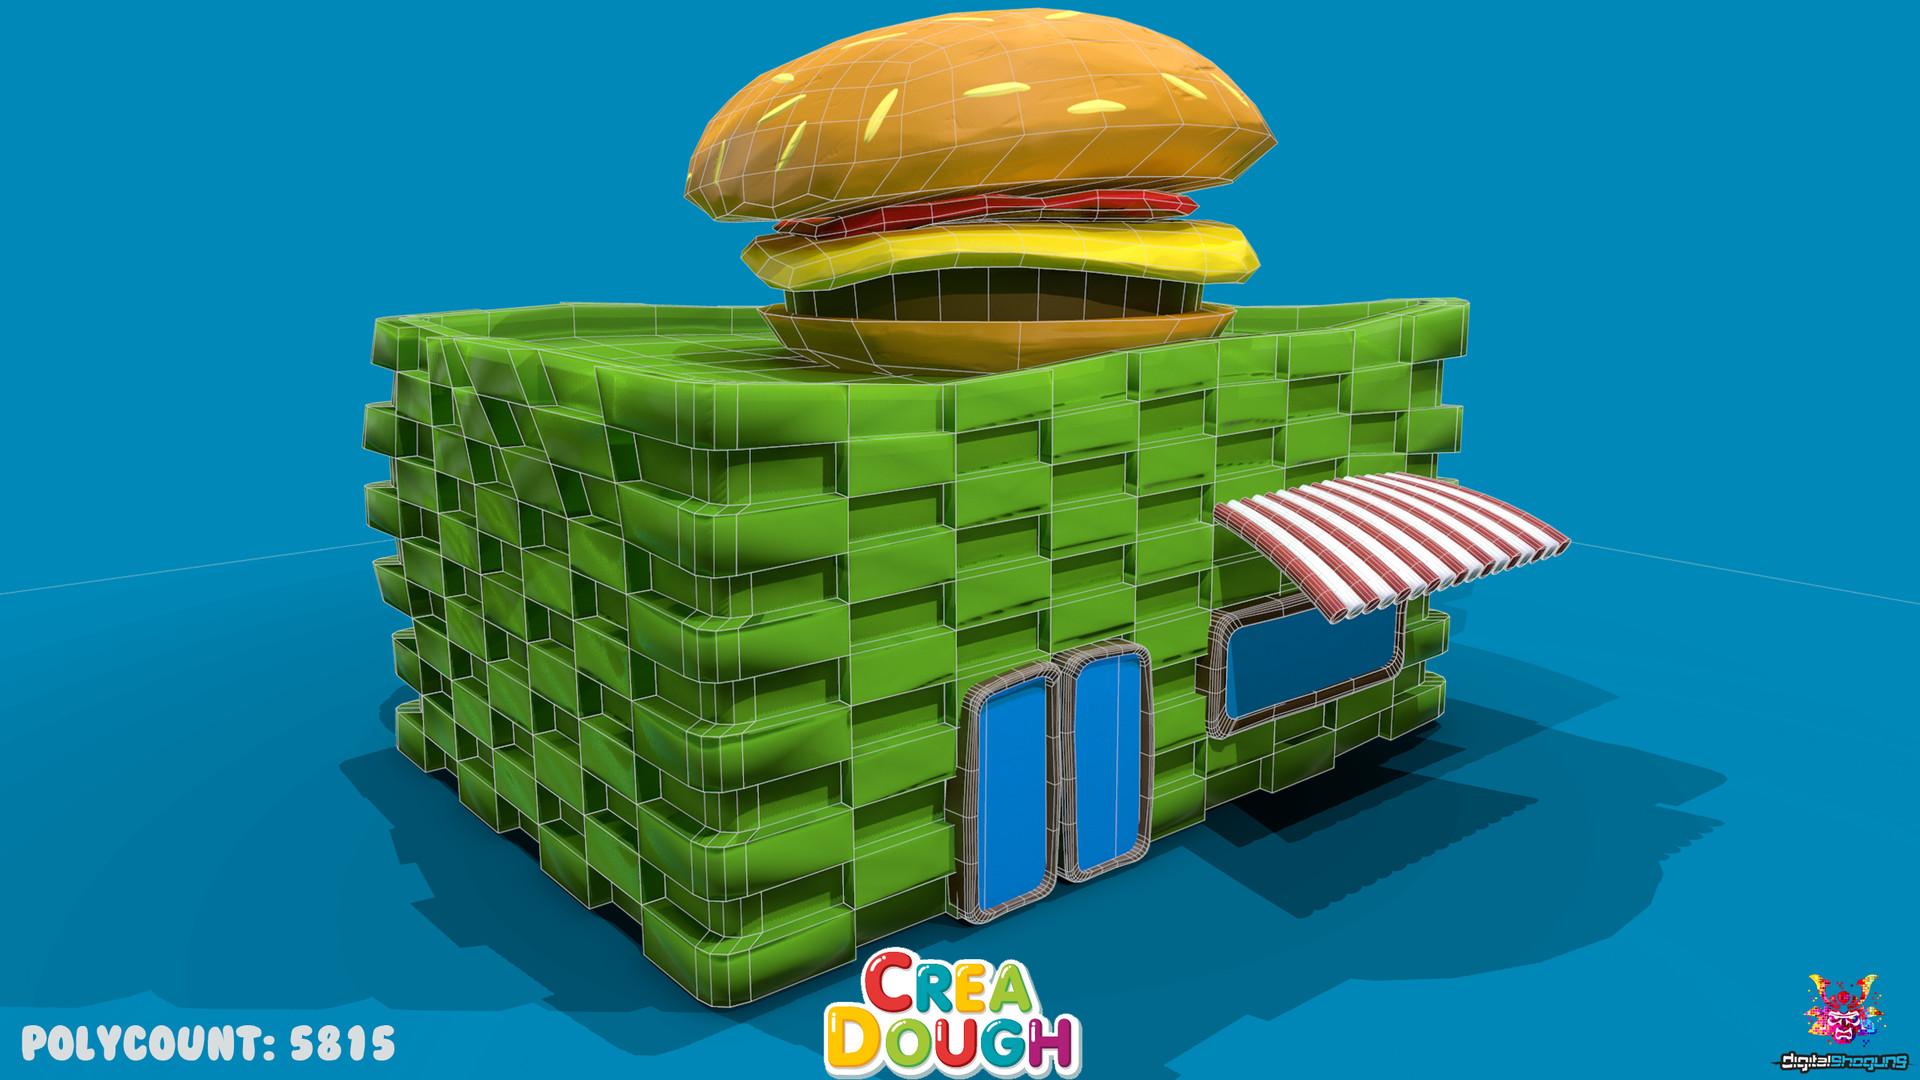 Martin giles burger building wire 001